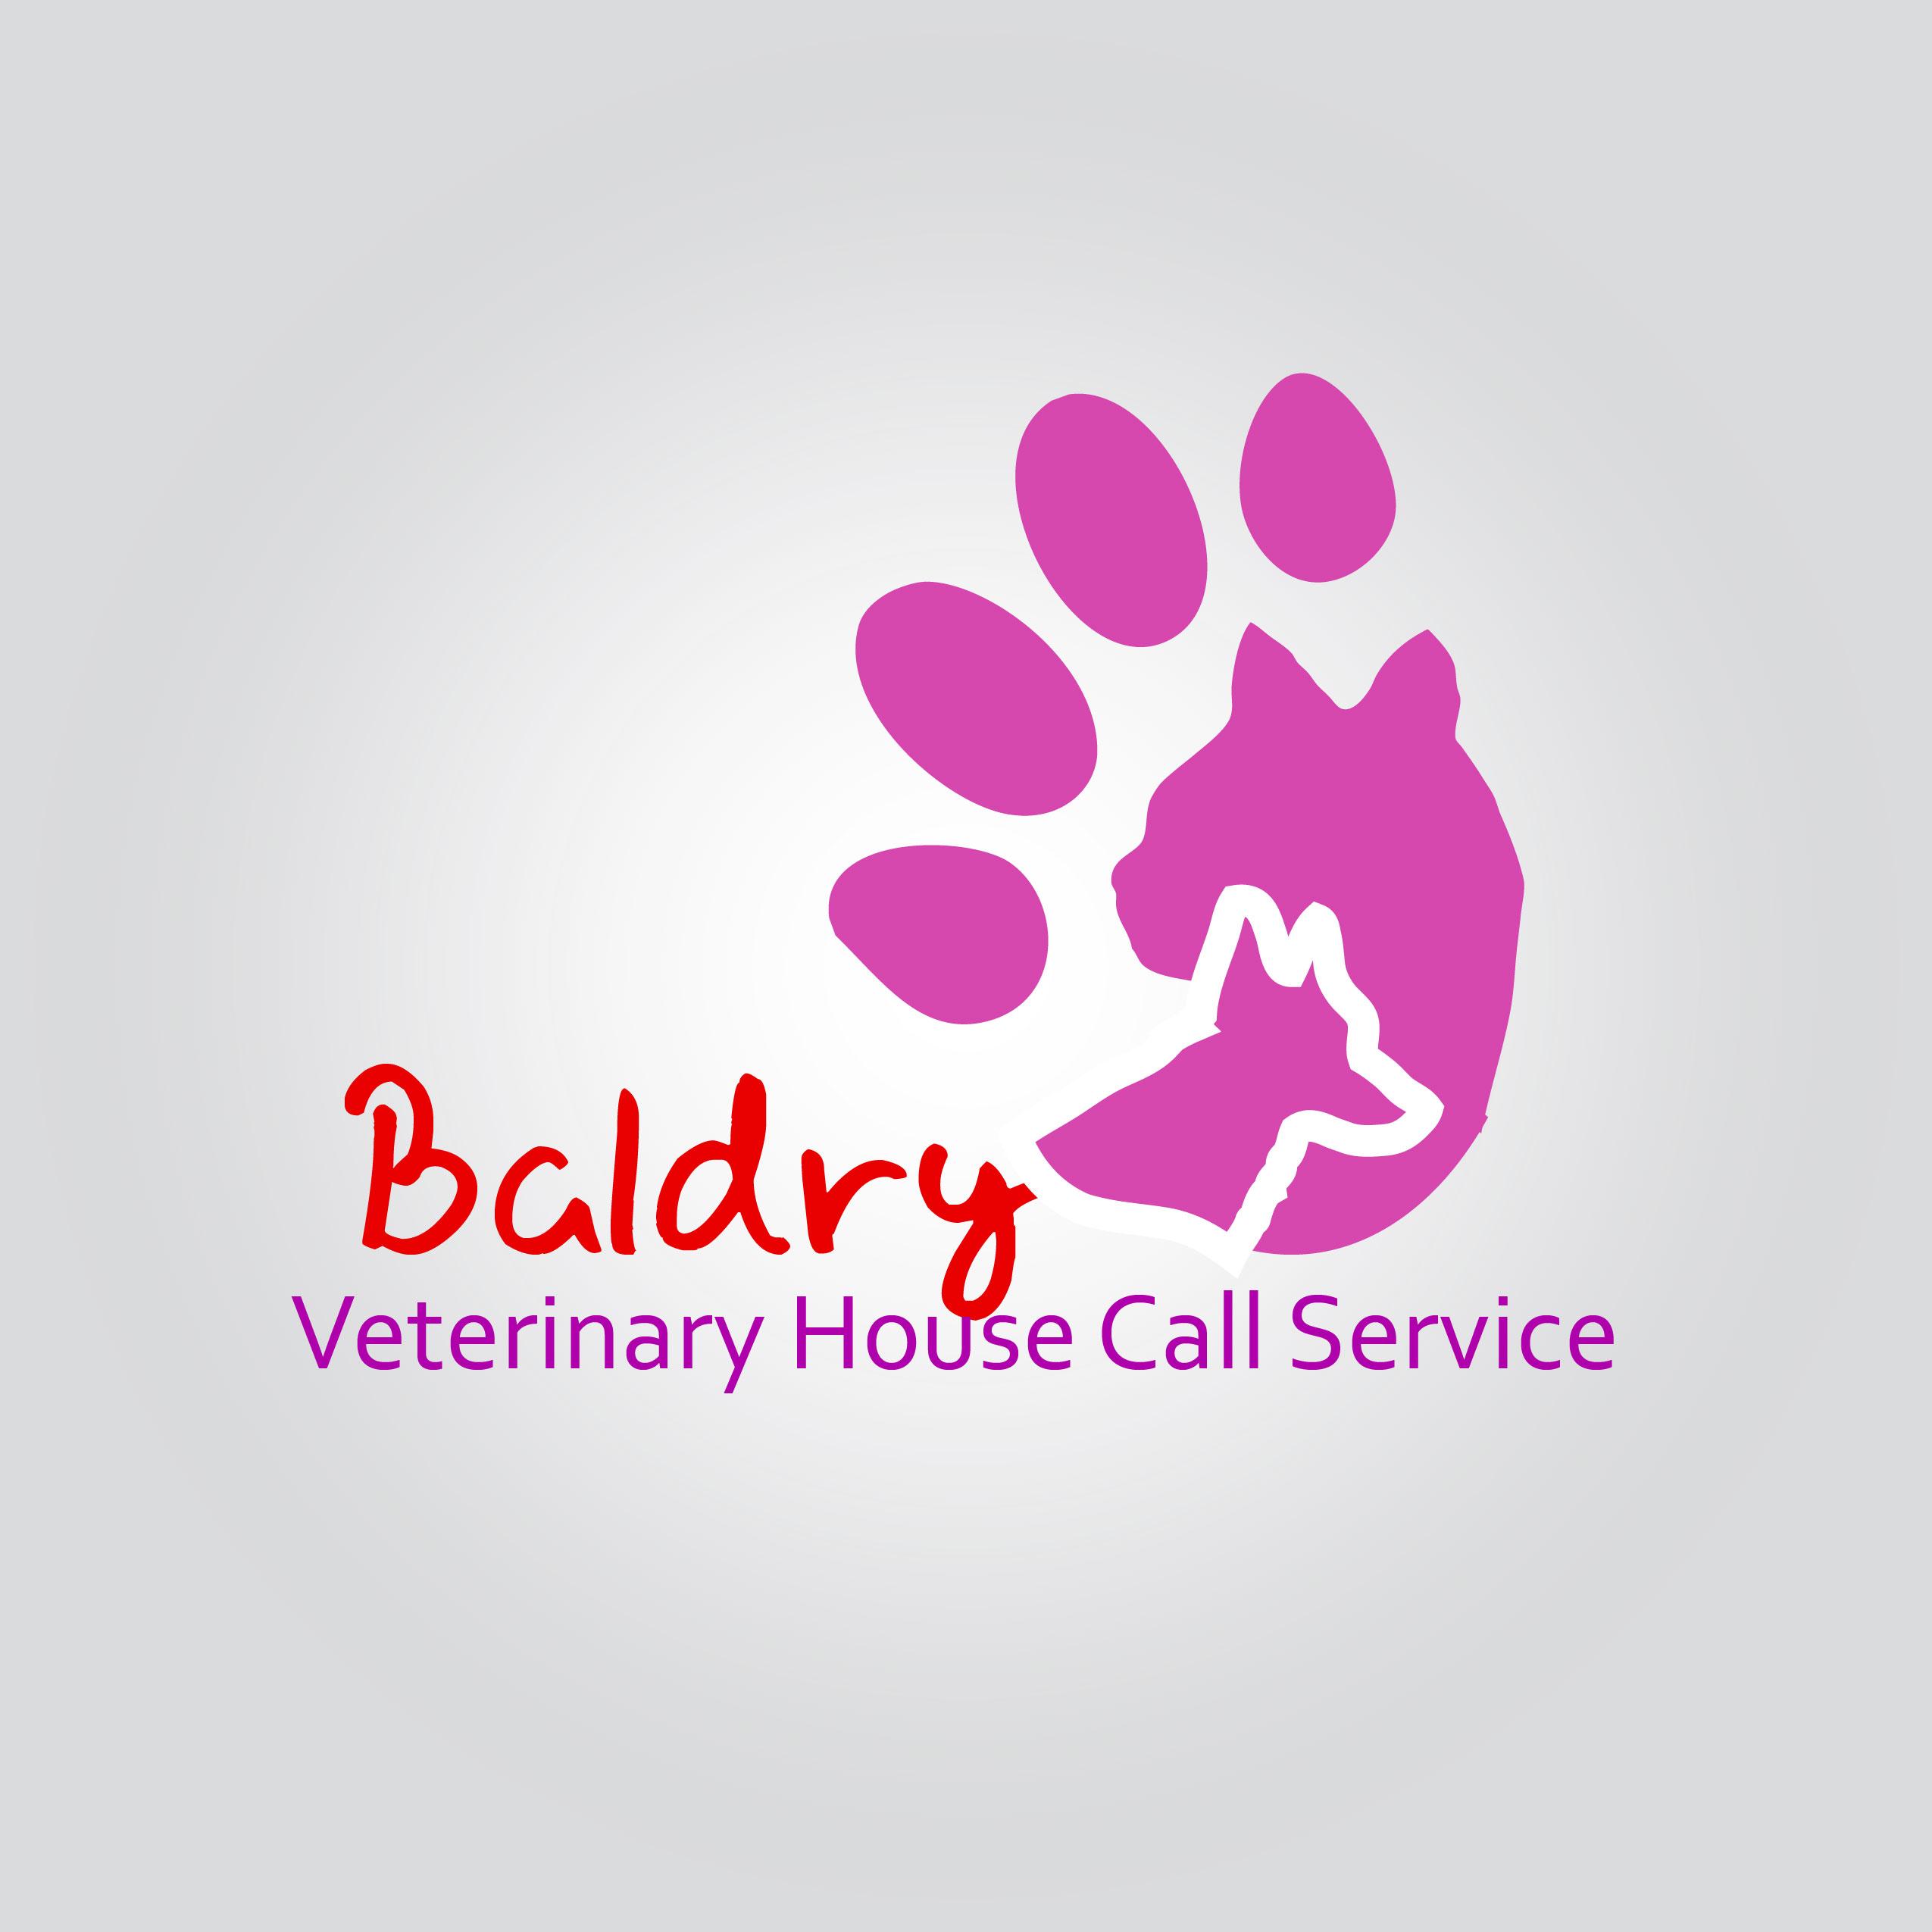 Logo Design by Joseph Lemuel Lacatan - Entry No. 41 in the Logo Design Contest Captivating Logo Design for Baldry Veterinary House Call Service.